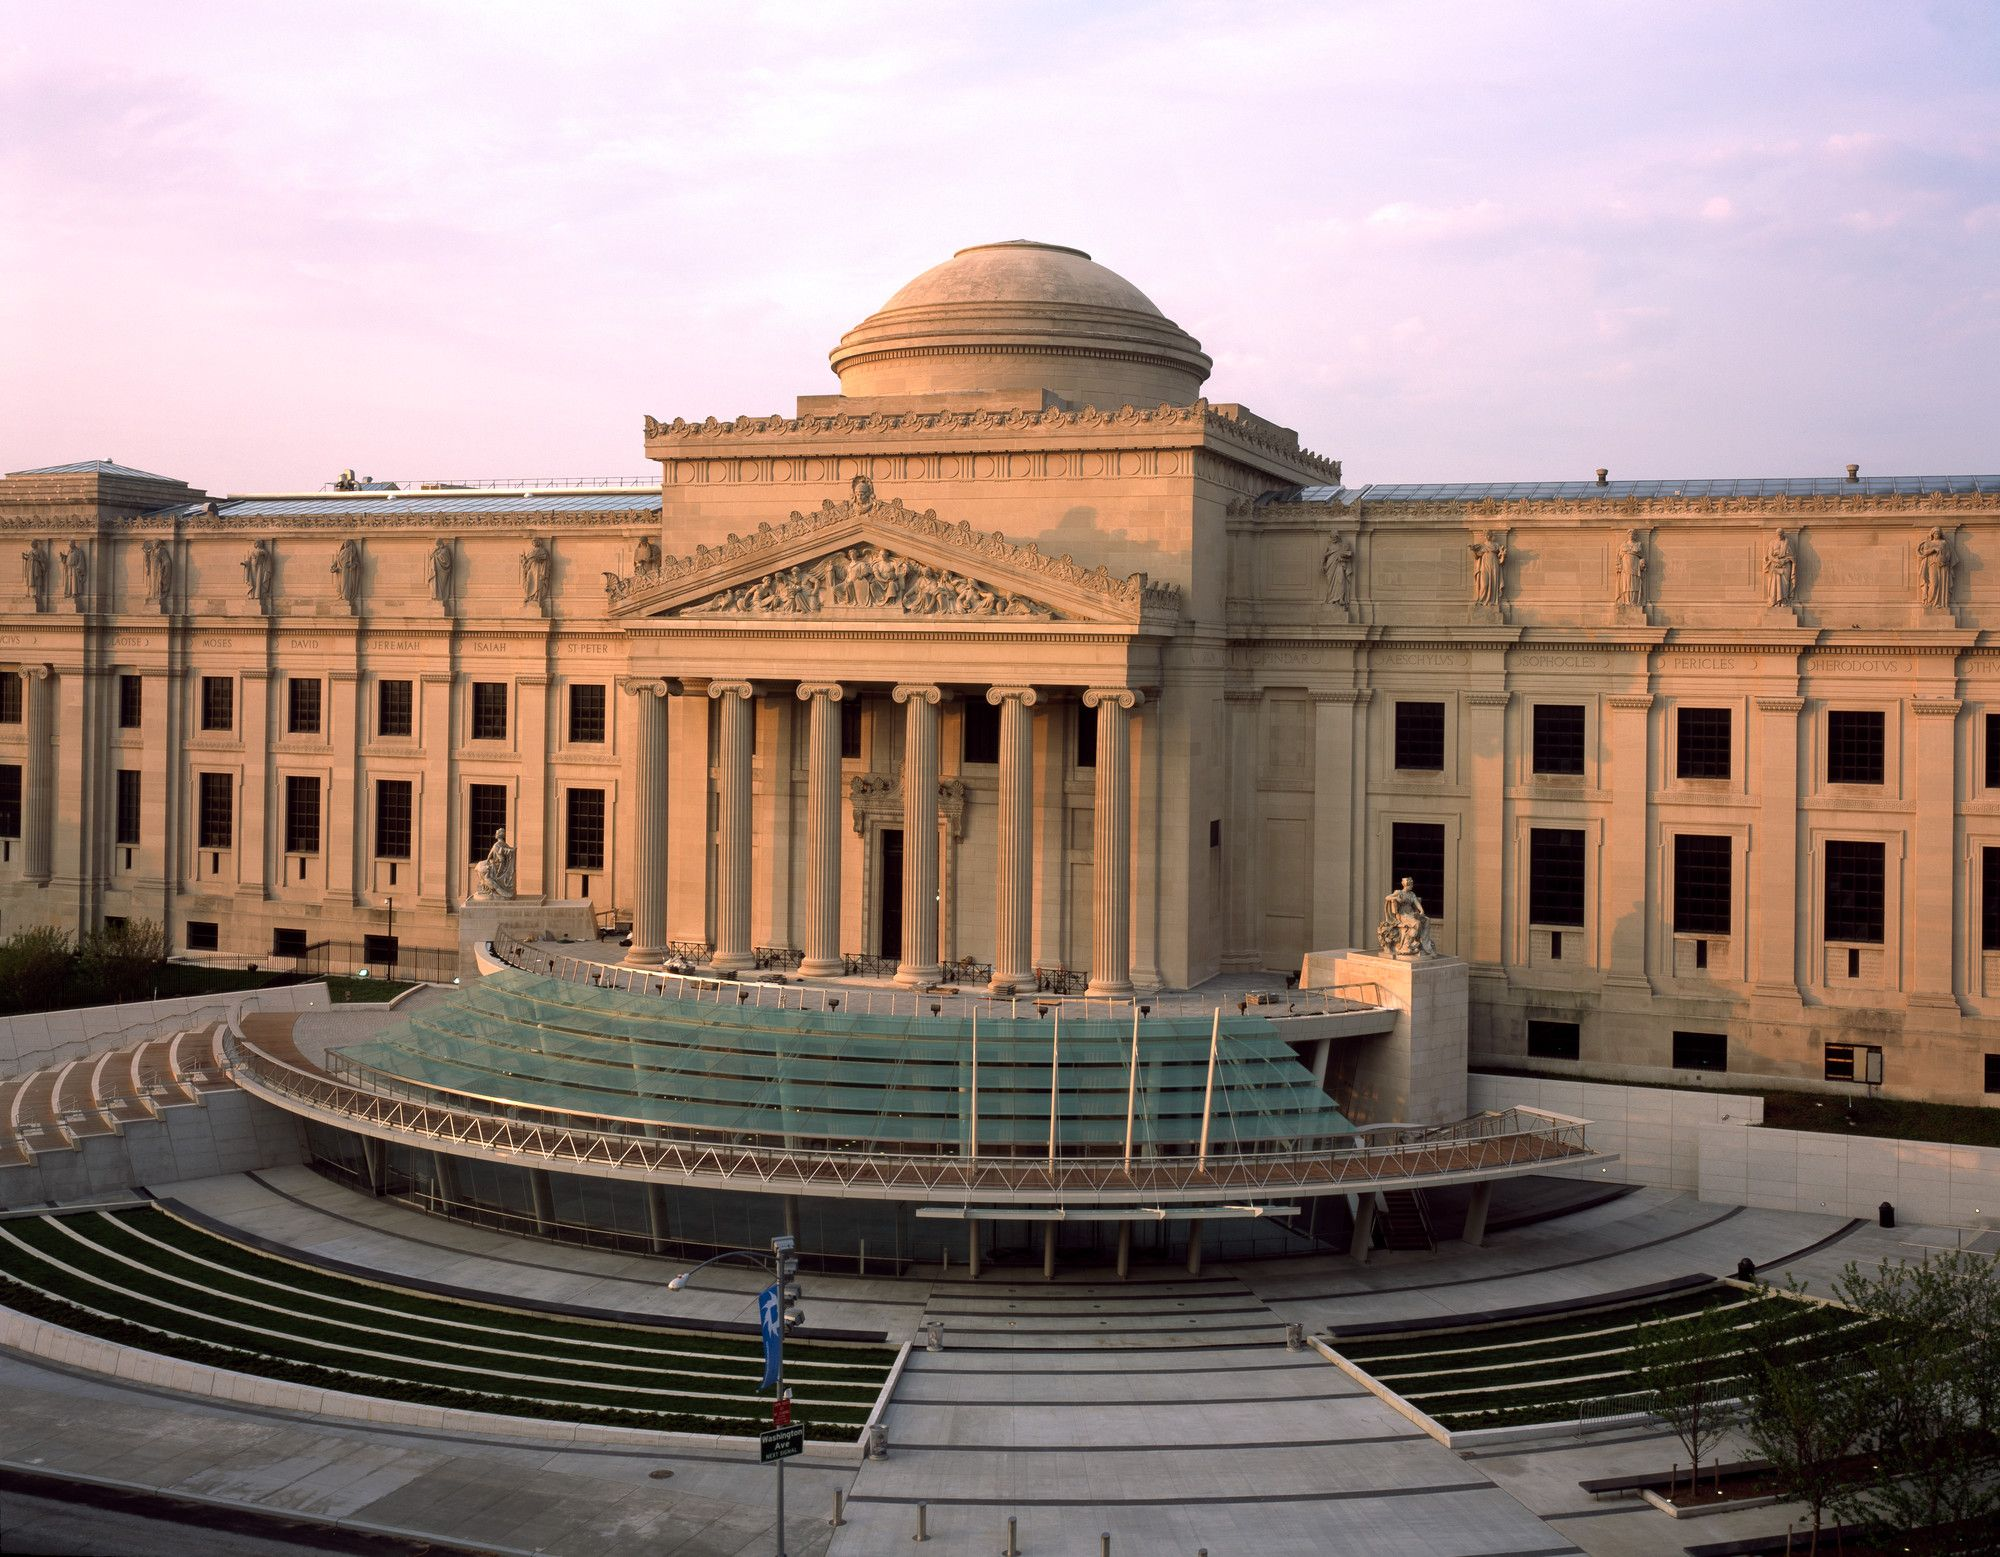 <p>Brooklyn Museum façade and plaza</p>